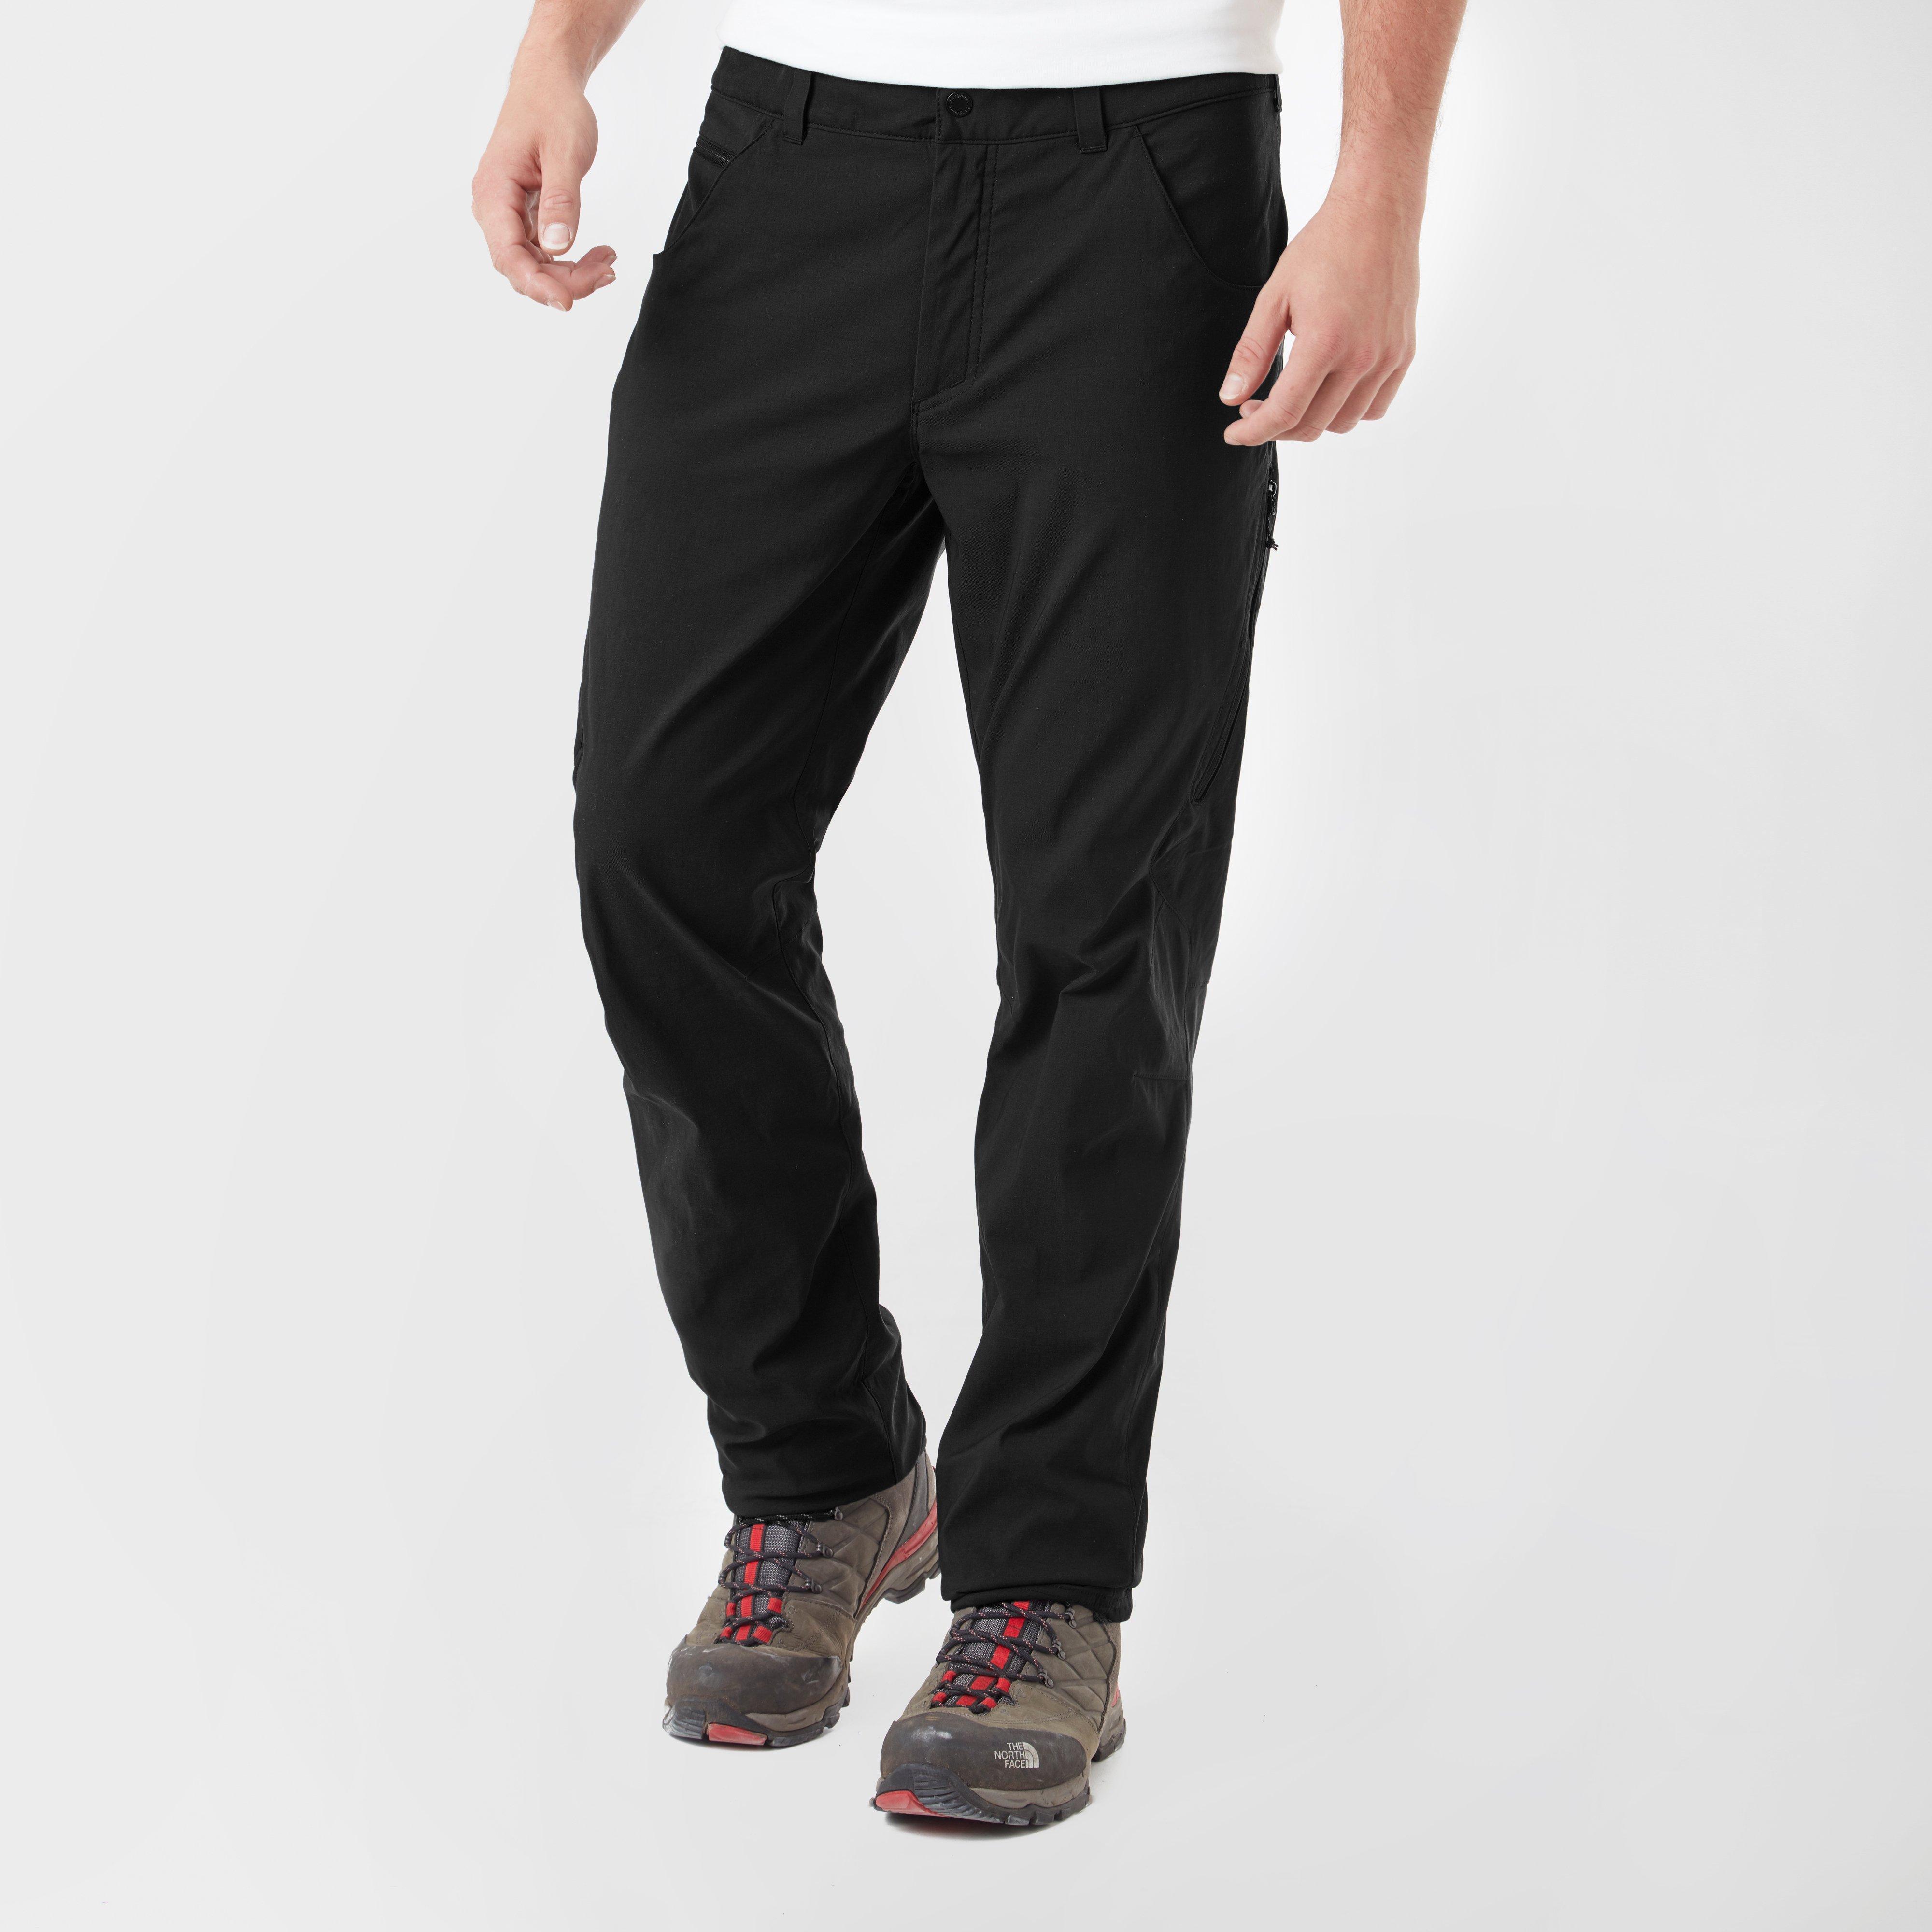 Berghaus Mens Ortler Pants - Black  Black